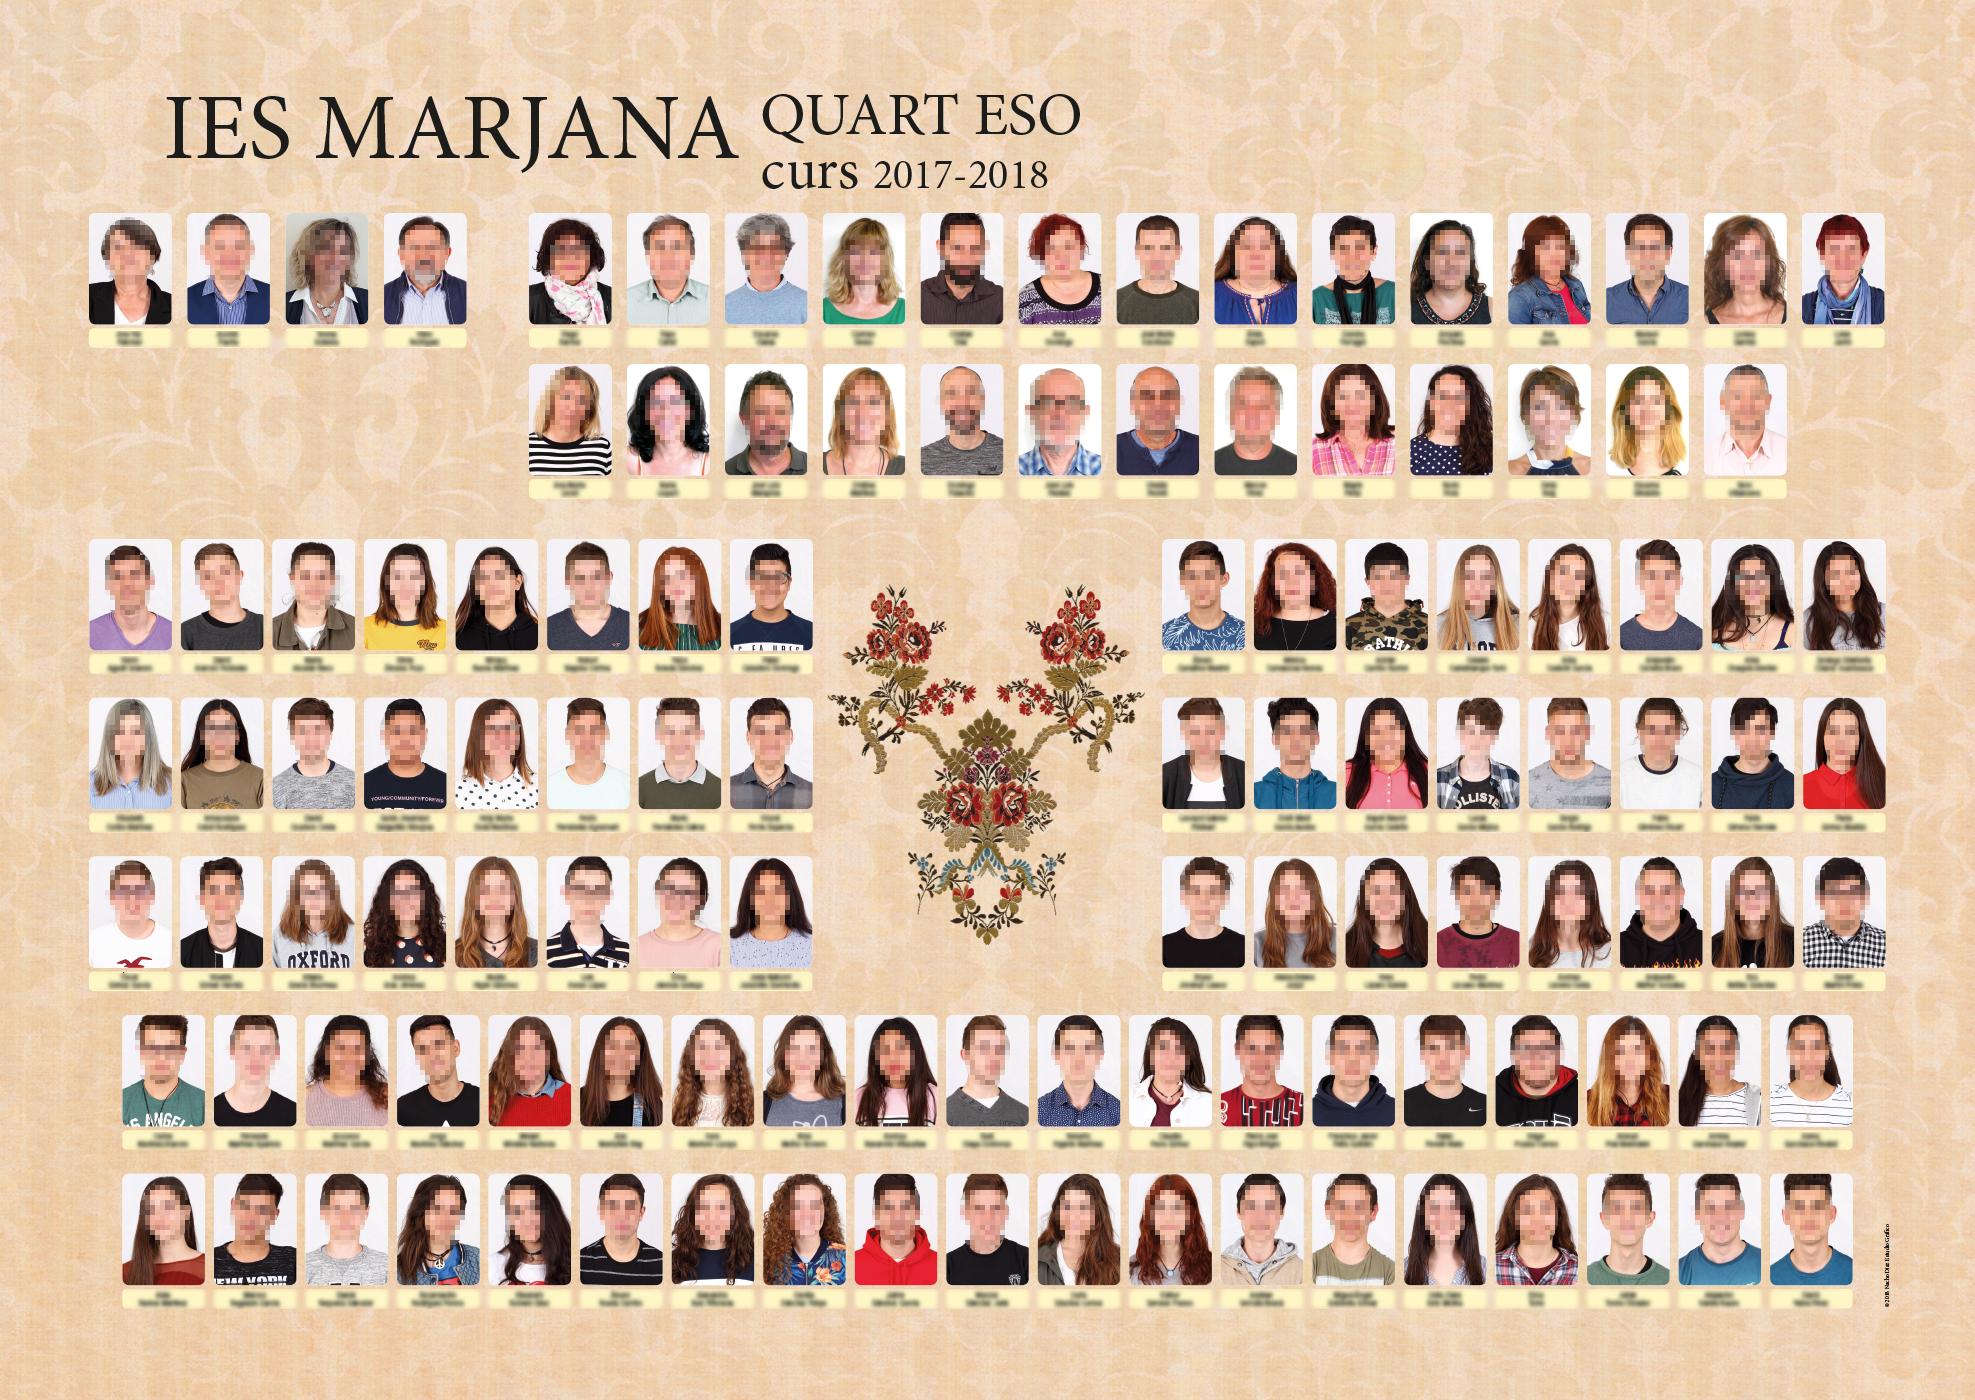 Orla-ESO-Marjana-2017-2018